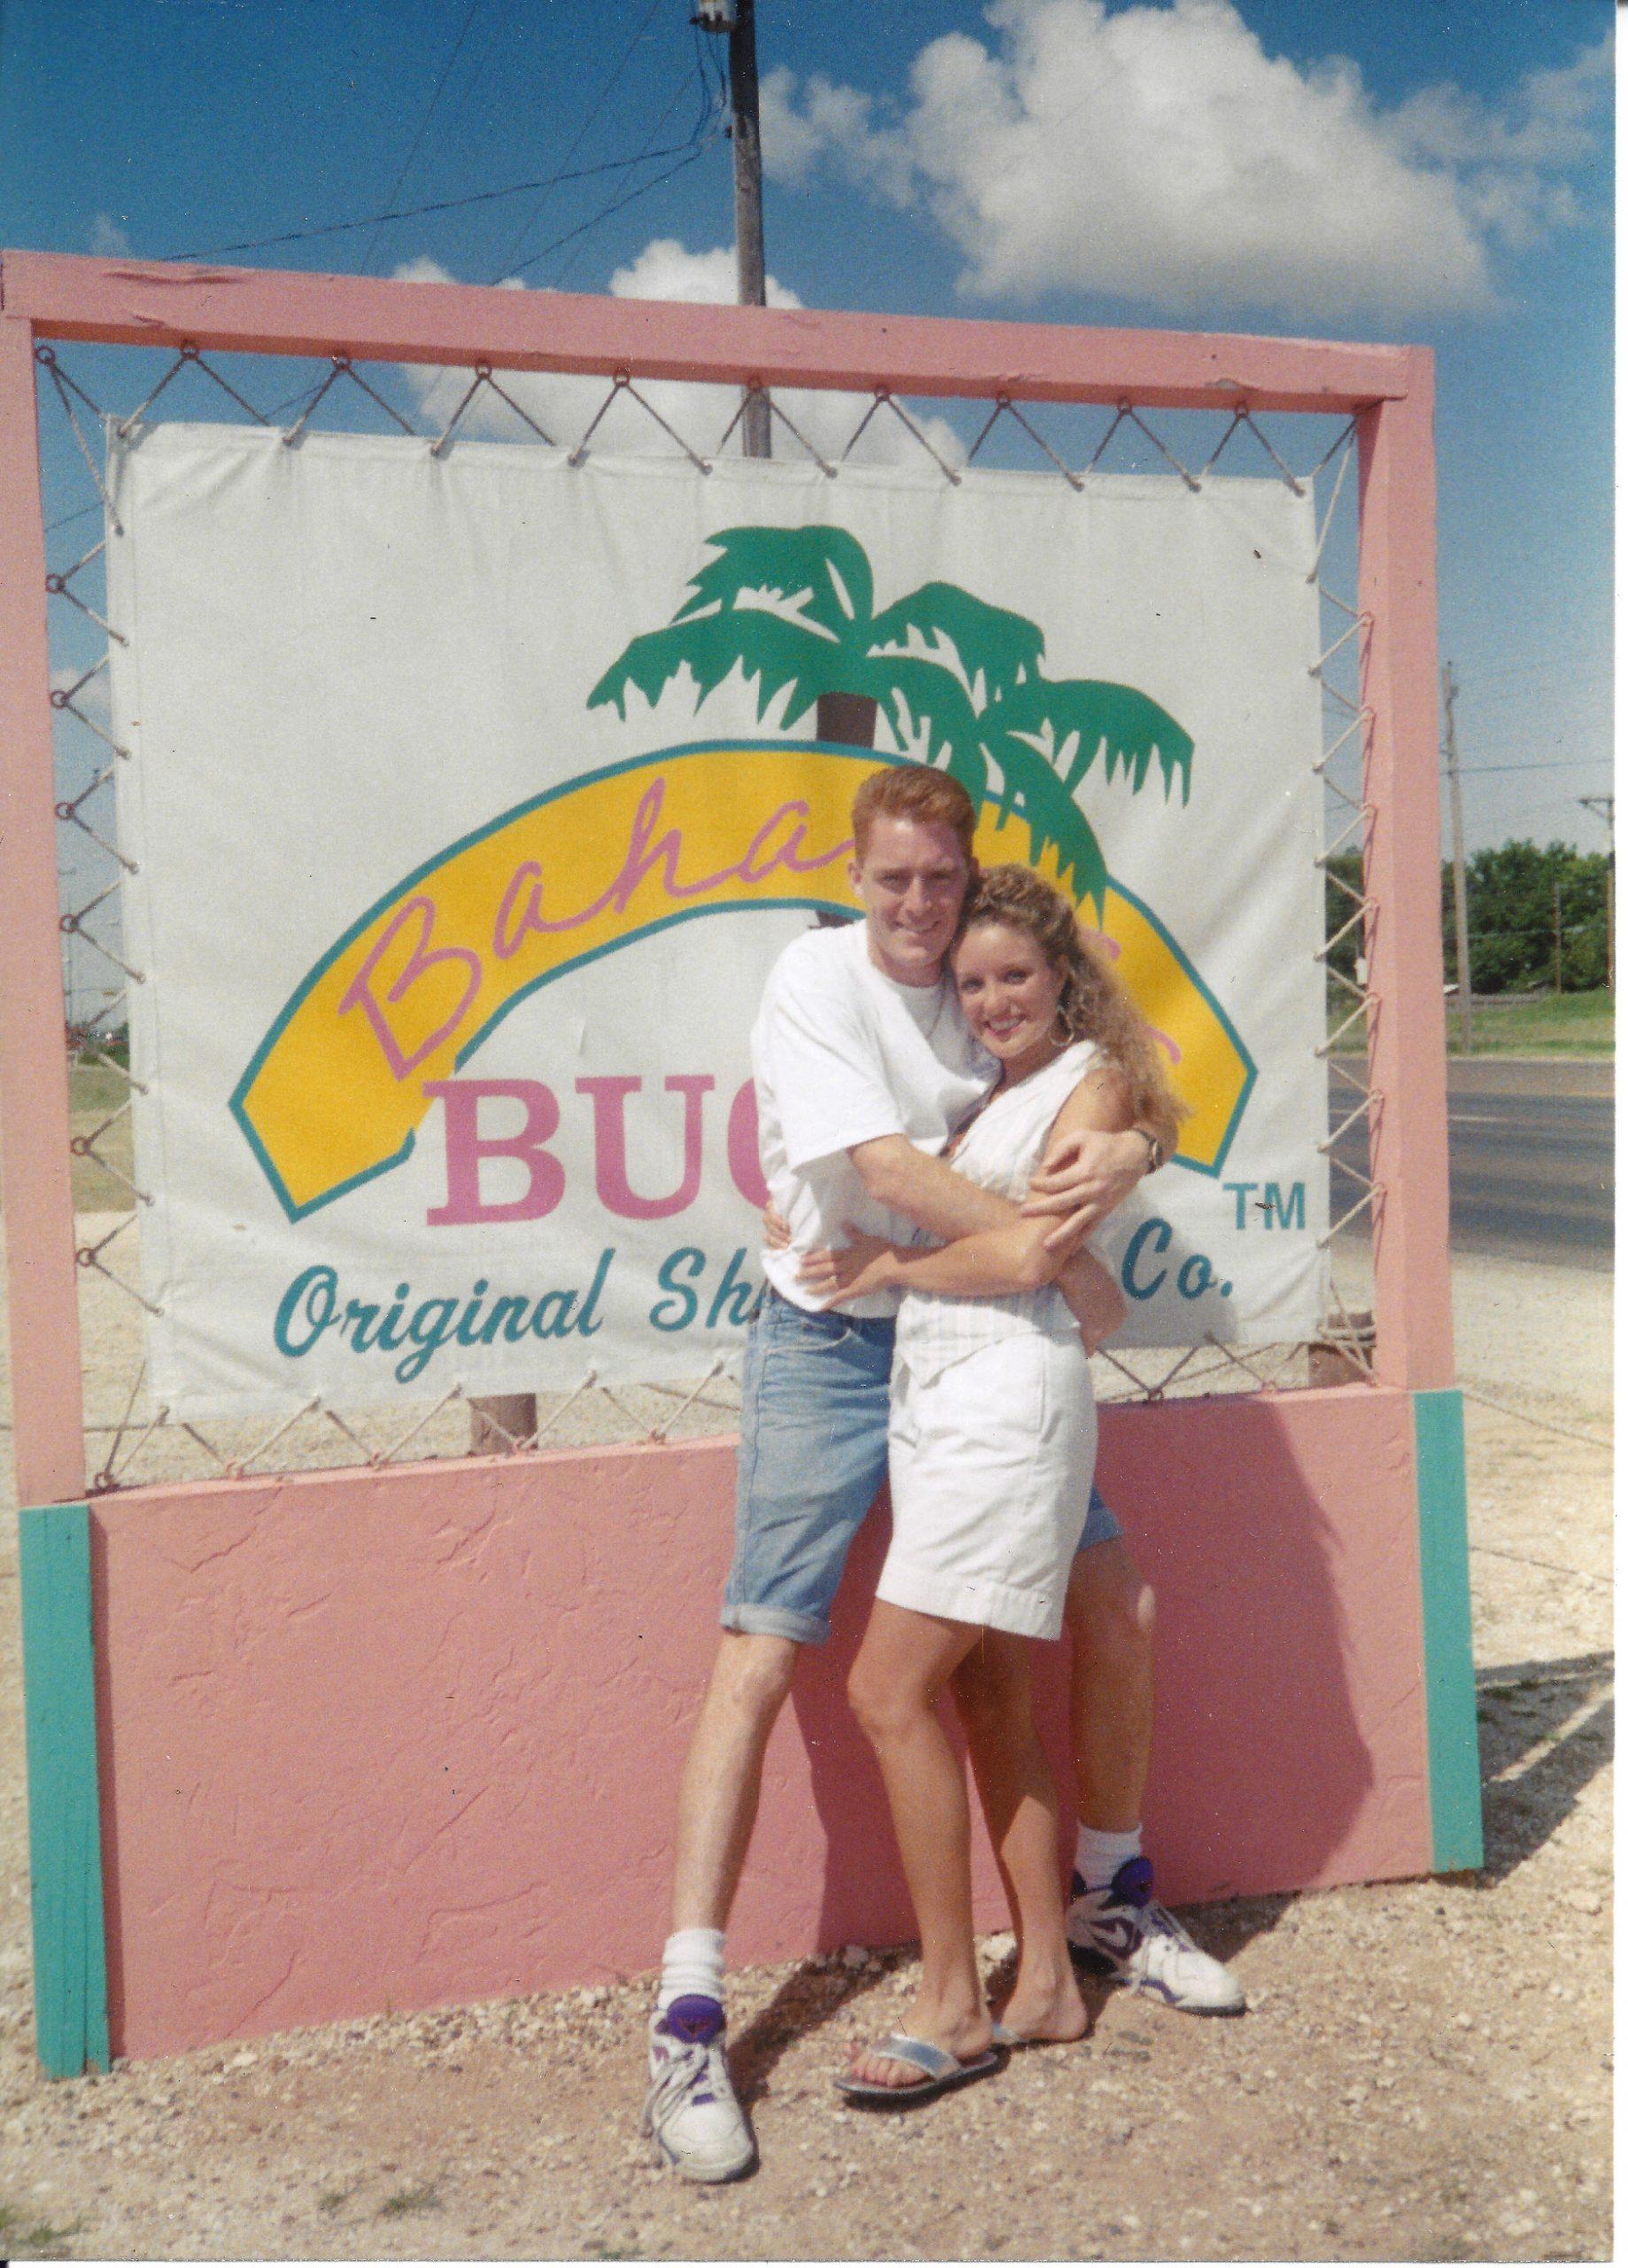 Bahama Bucks Founders Blake and Kippi Buchanan standing outside of their original store